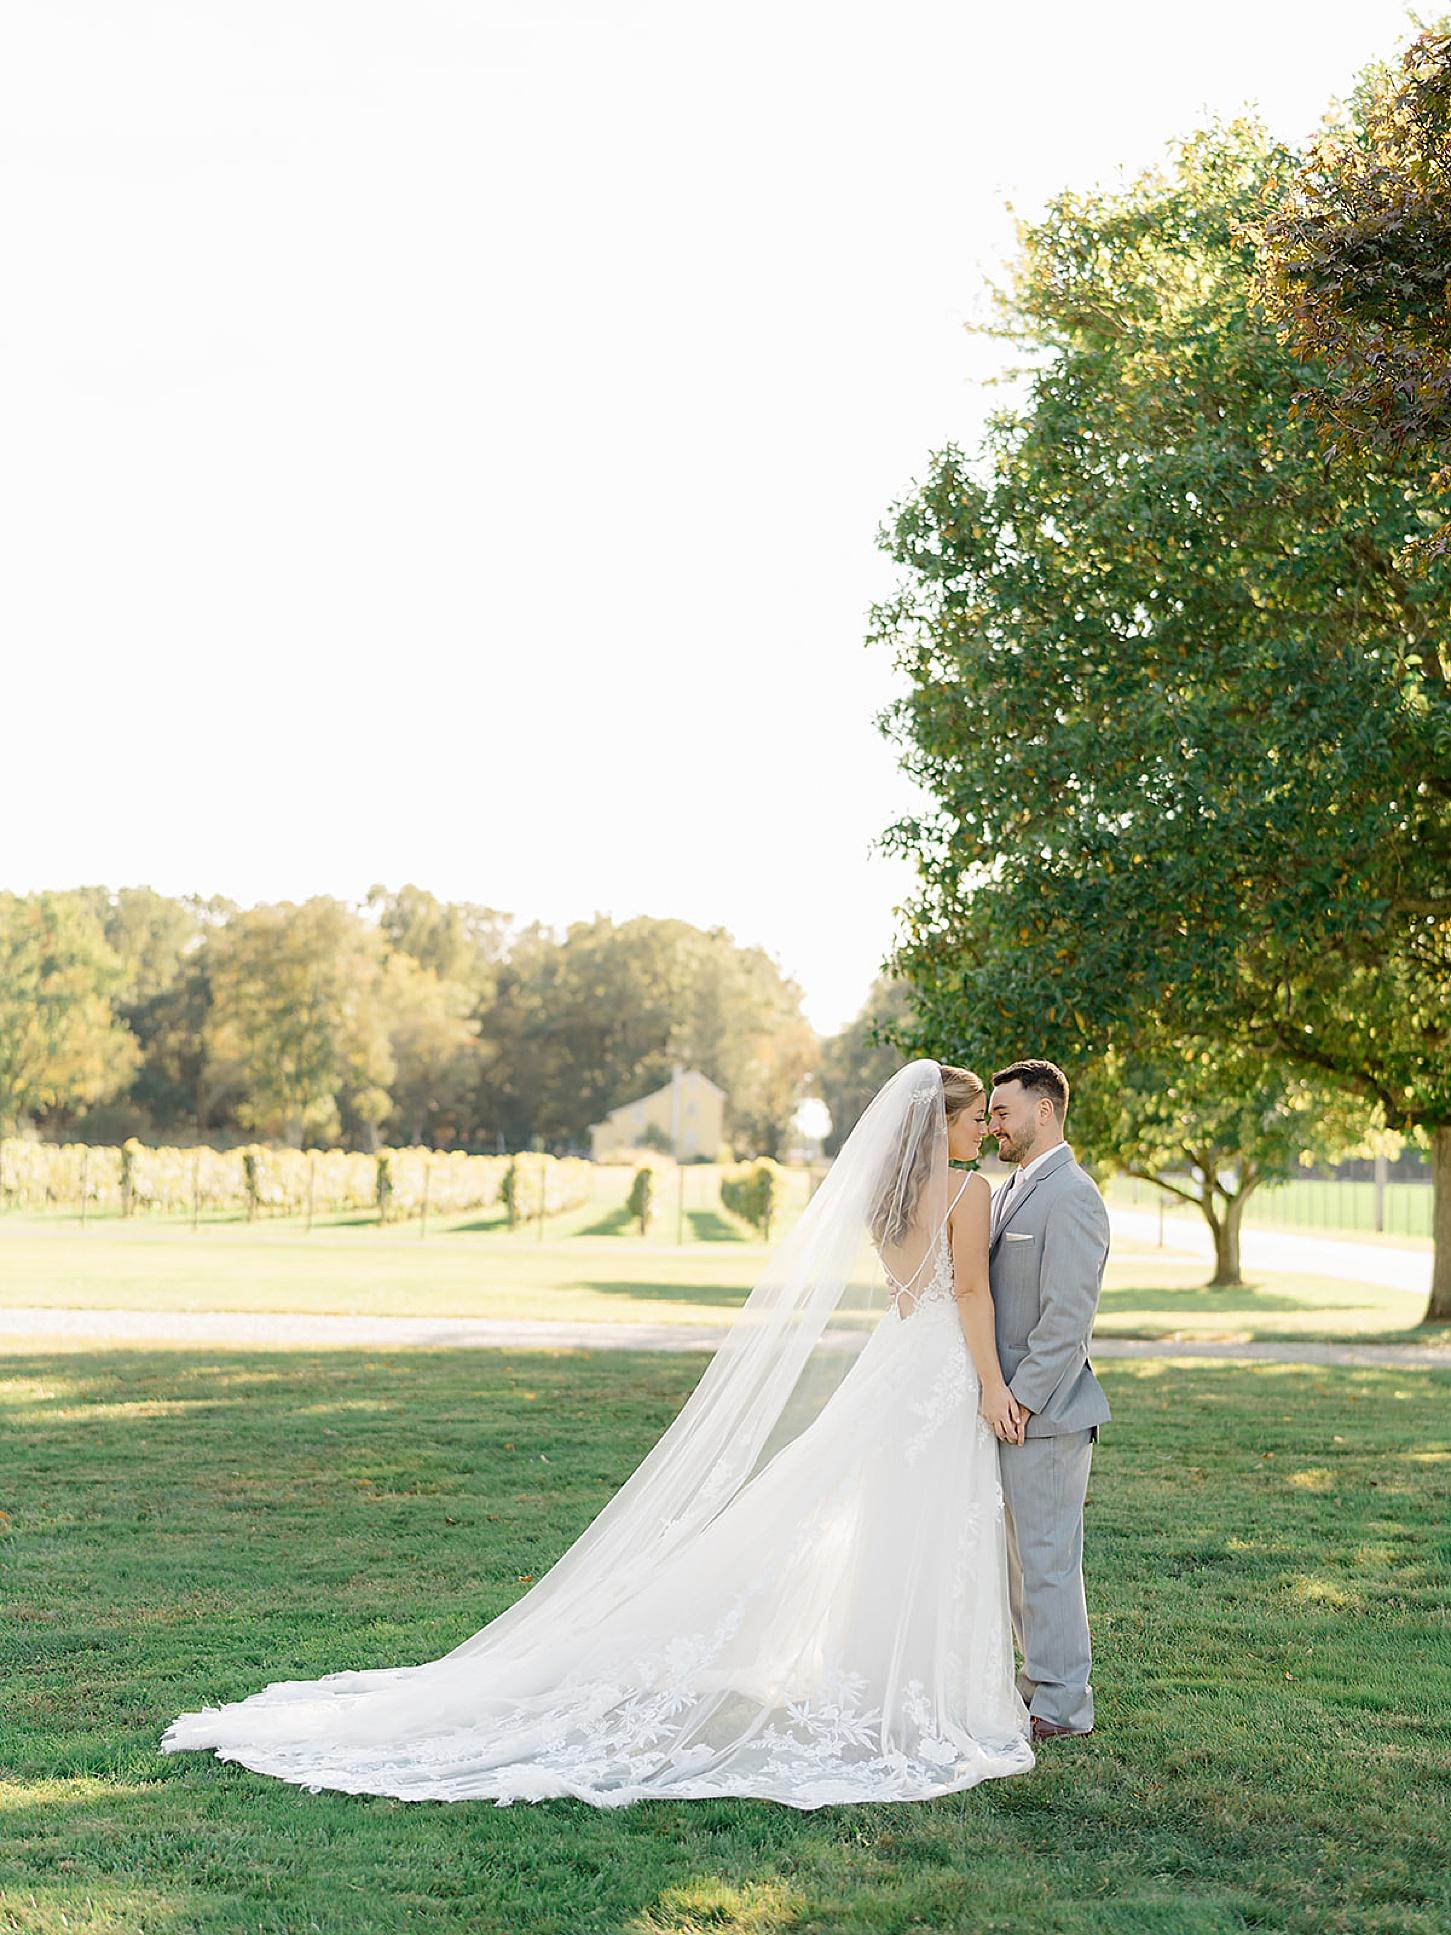 Valenzano Winery Vitners Pavillion Wedding Photography by Magdalena Studios 0027